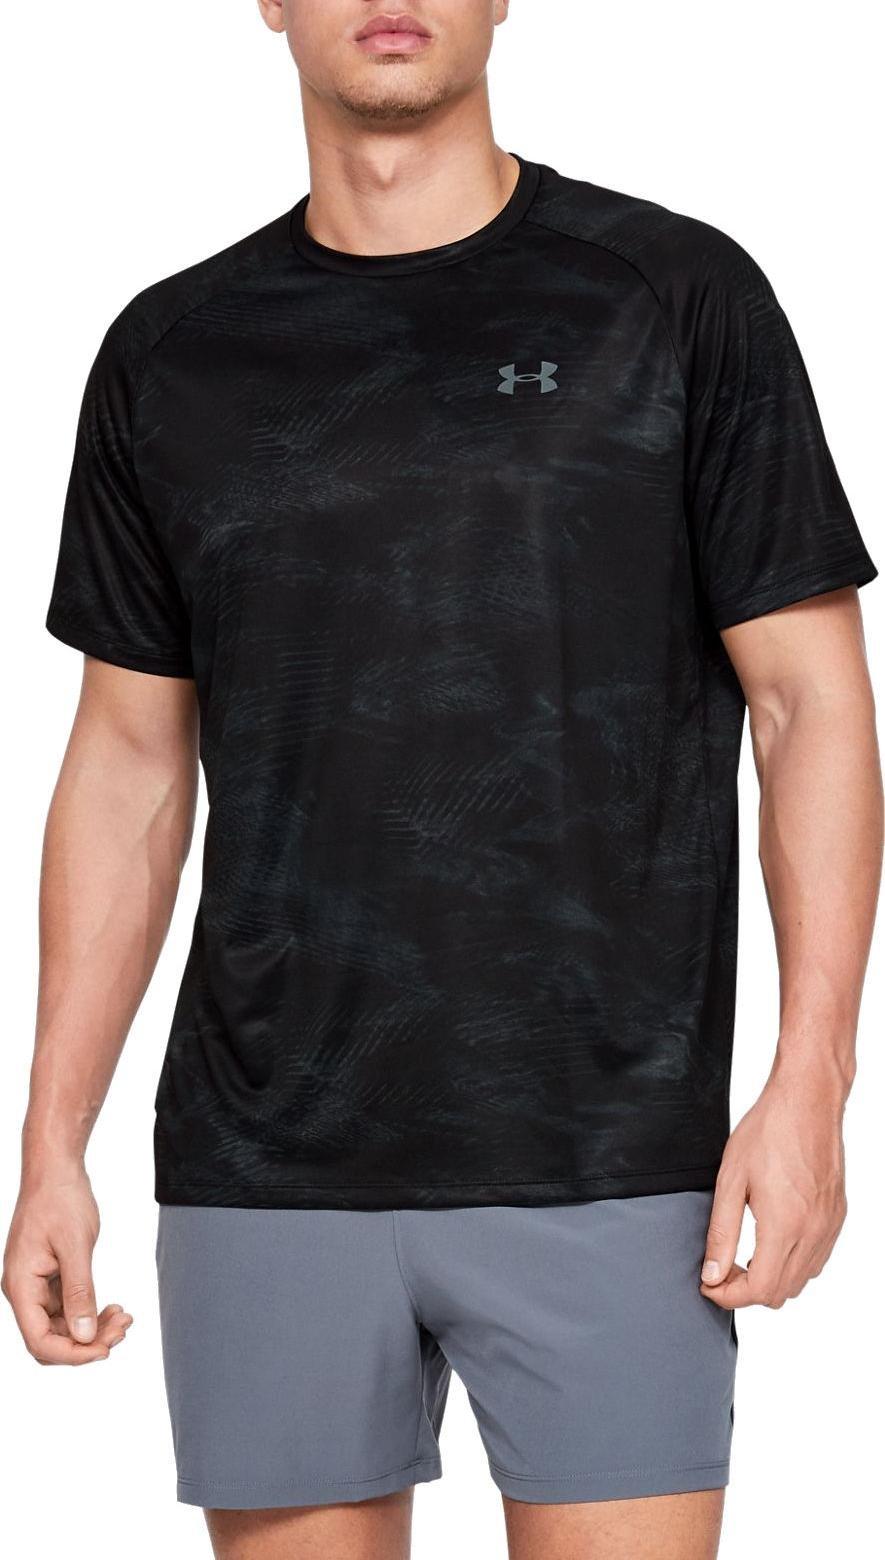 Camiseta Under Armour UA Tech 2.0 SS Printed